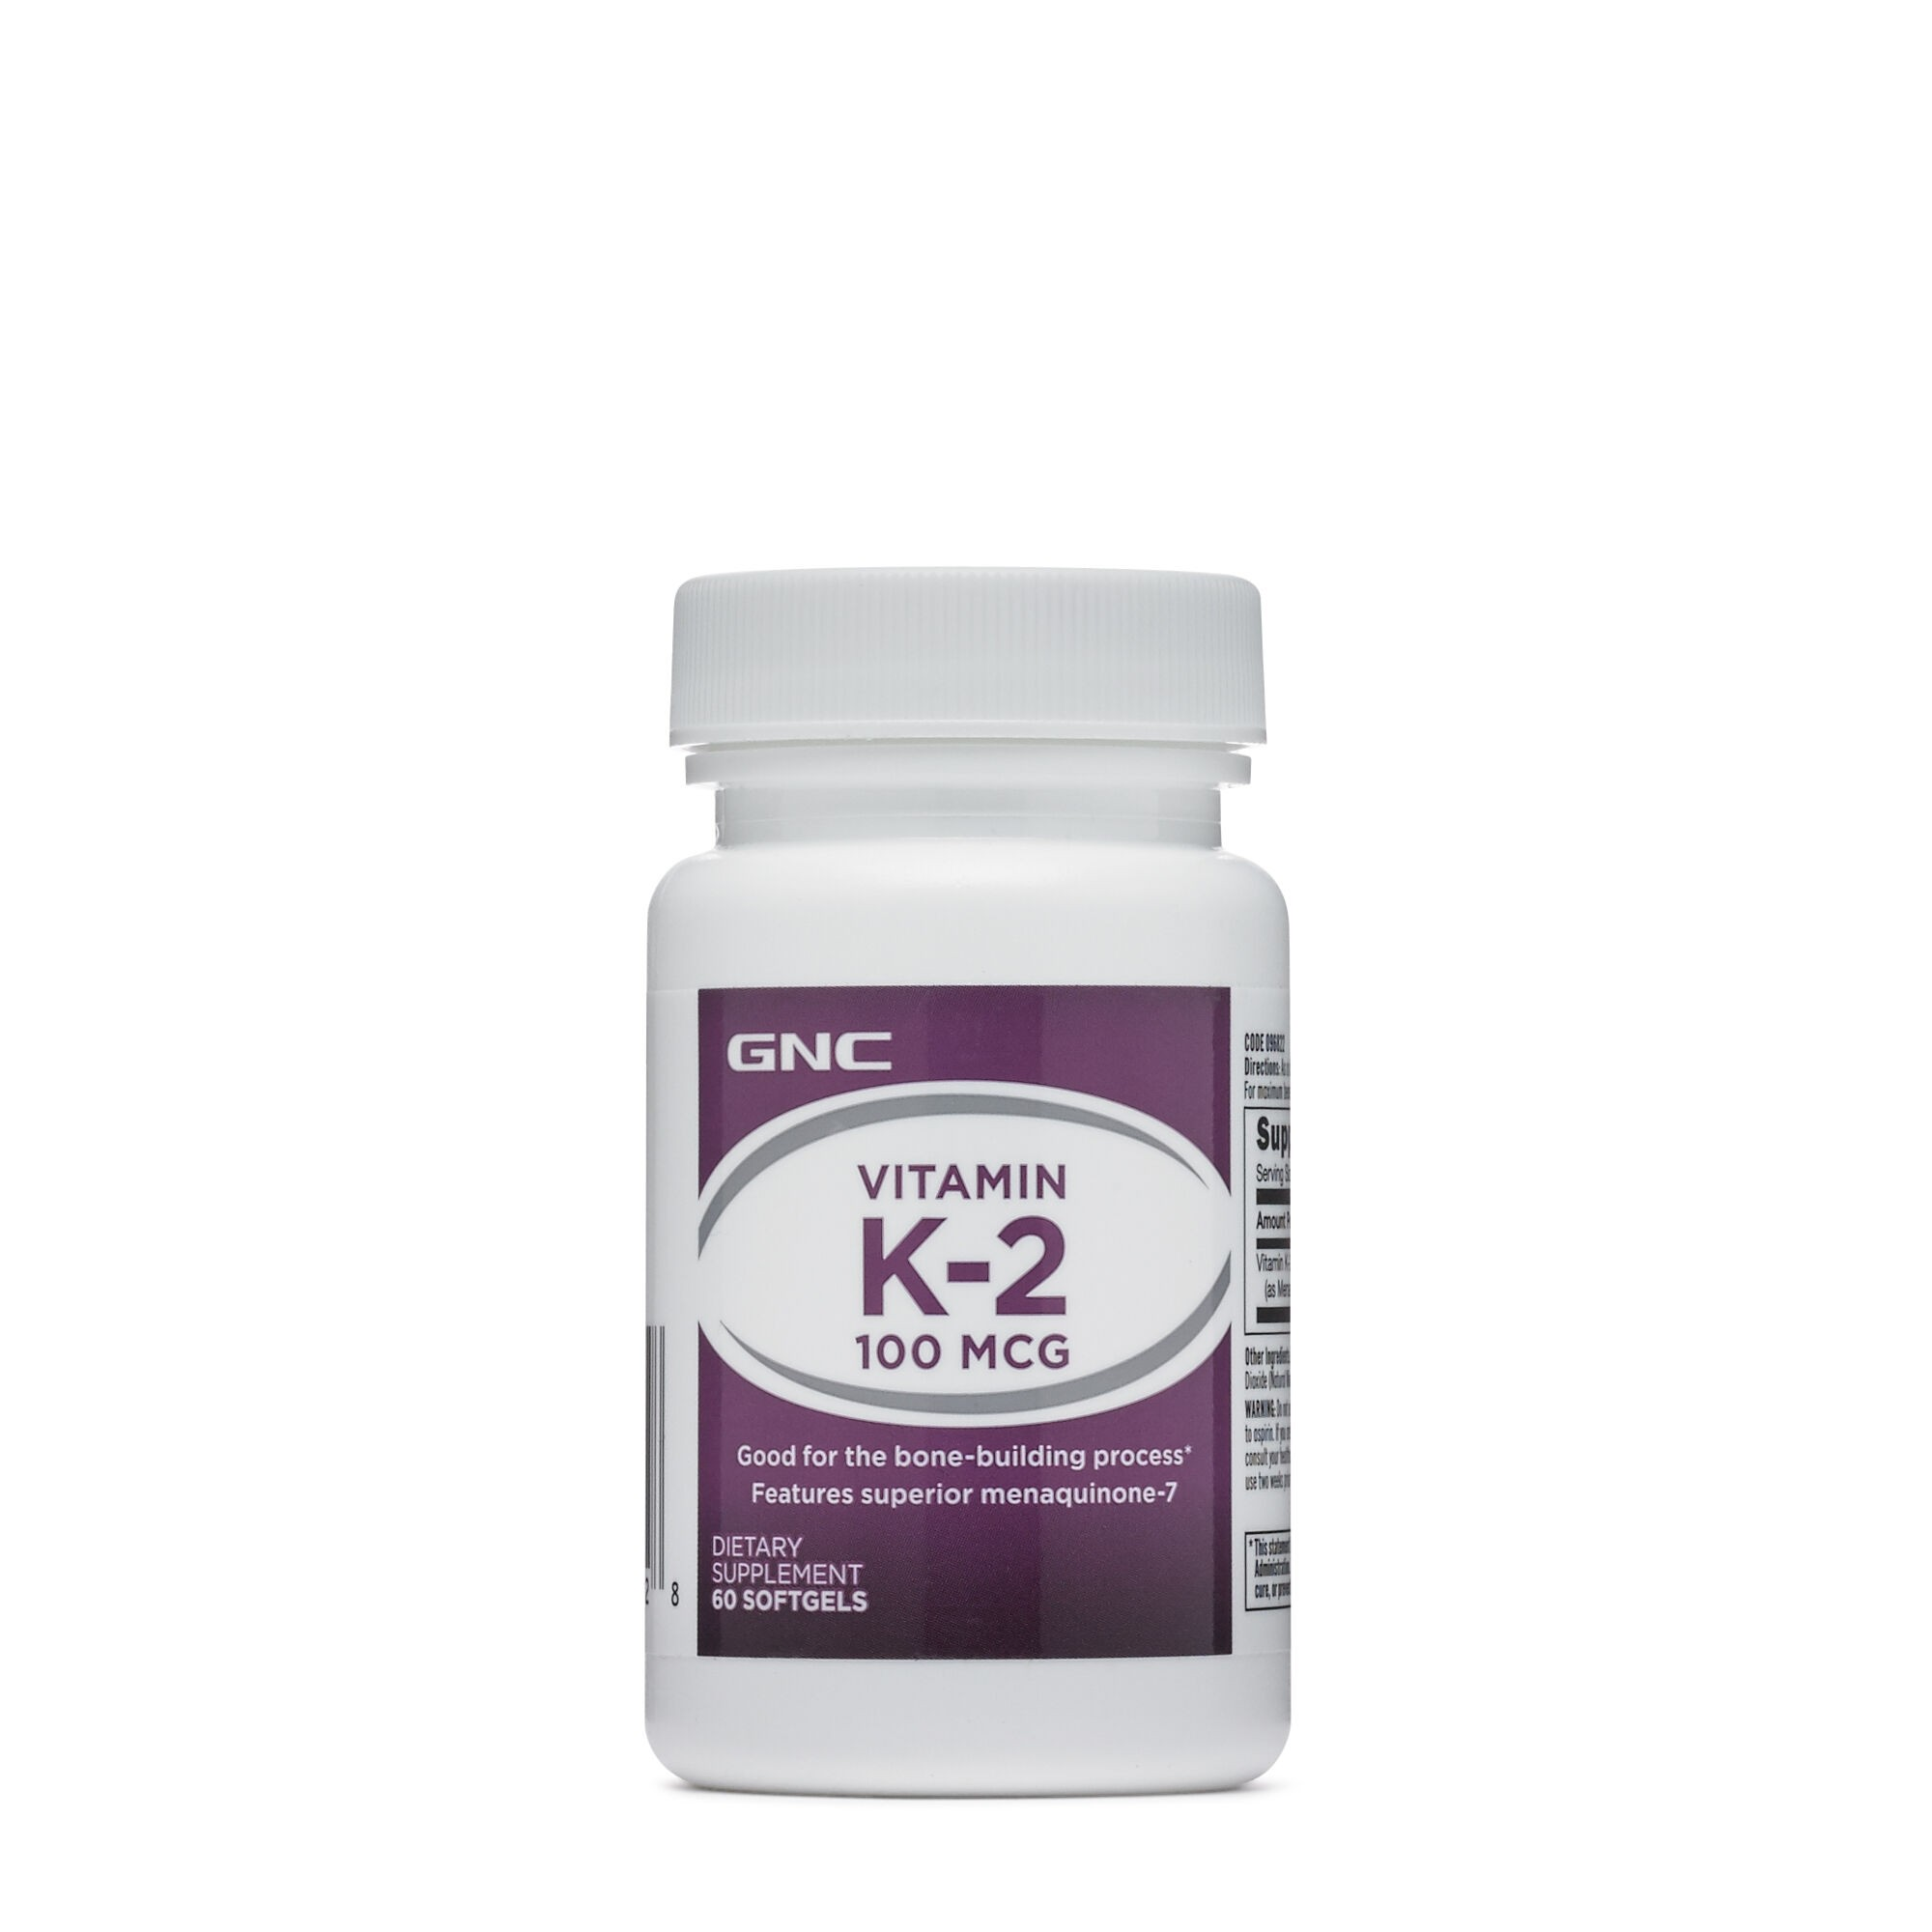 GNC Vitamin MK-7 K-2-100 mcg, Vitamina K 2, 60 cps